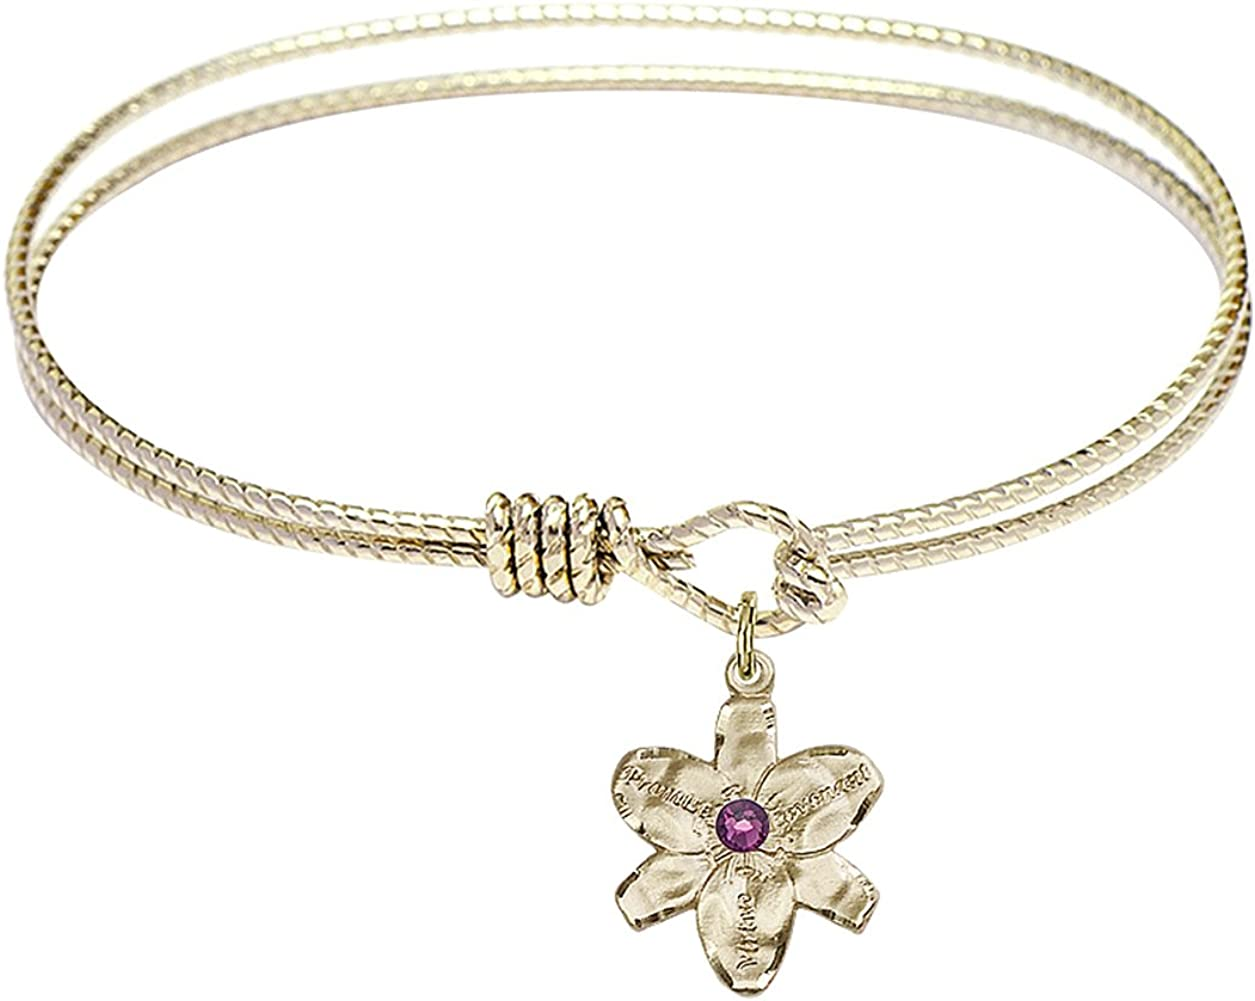 DiamondJewelryNY Ranking TOP4 Eye Hook Bangle Max 63% OFF Bracelet Charm. with a Chastity